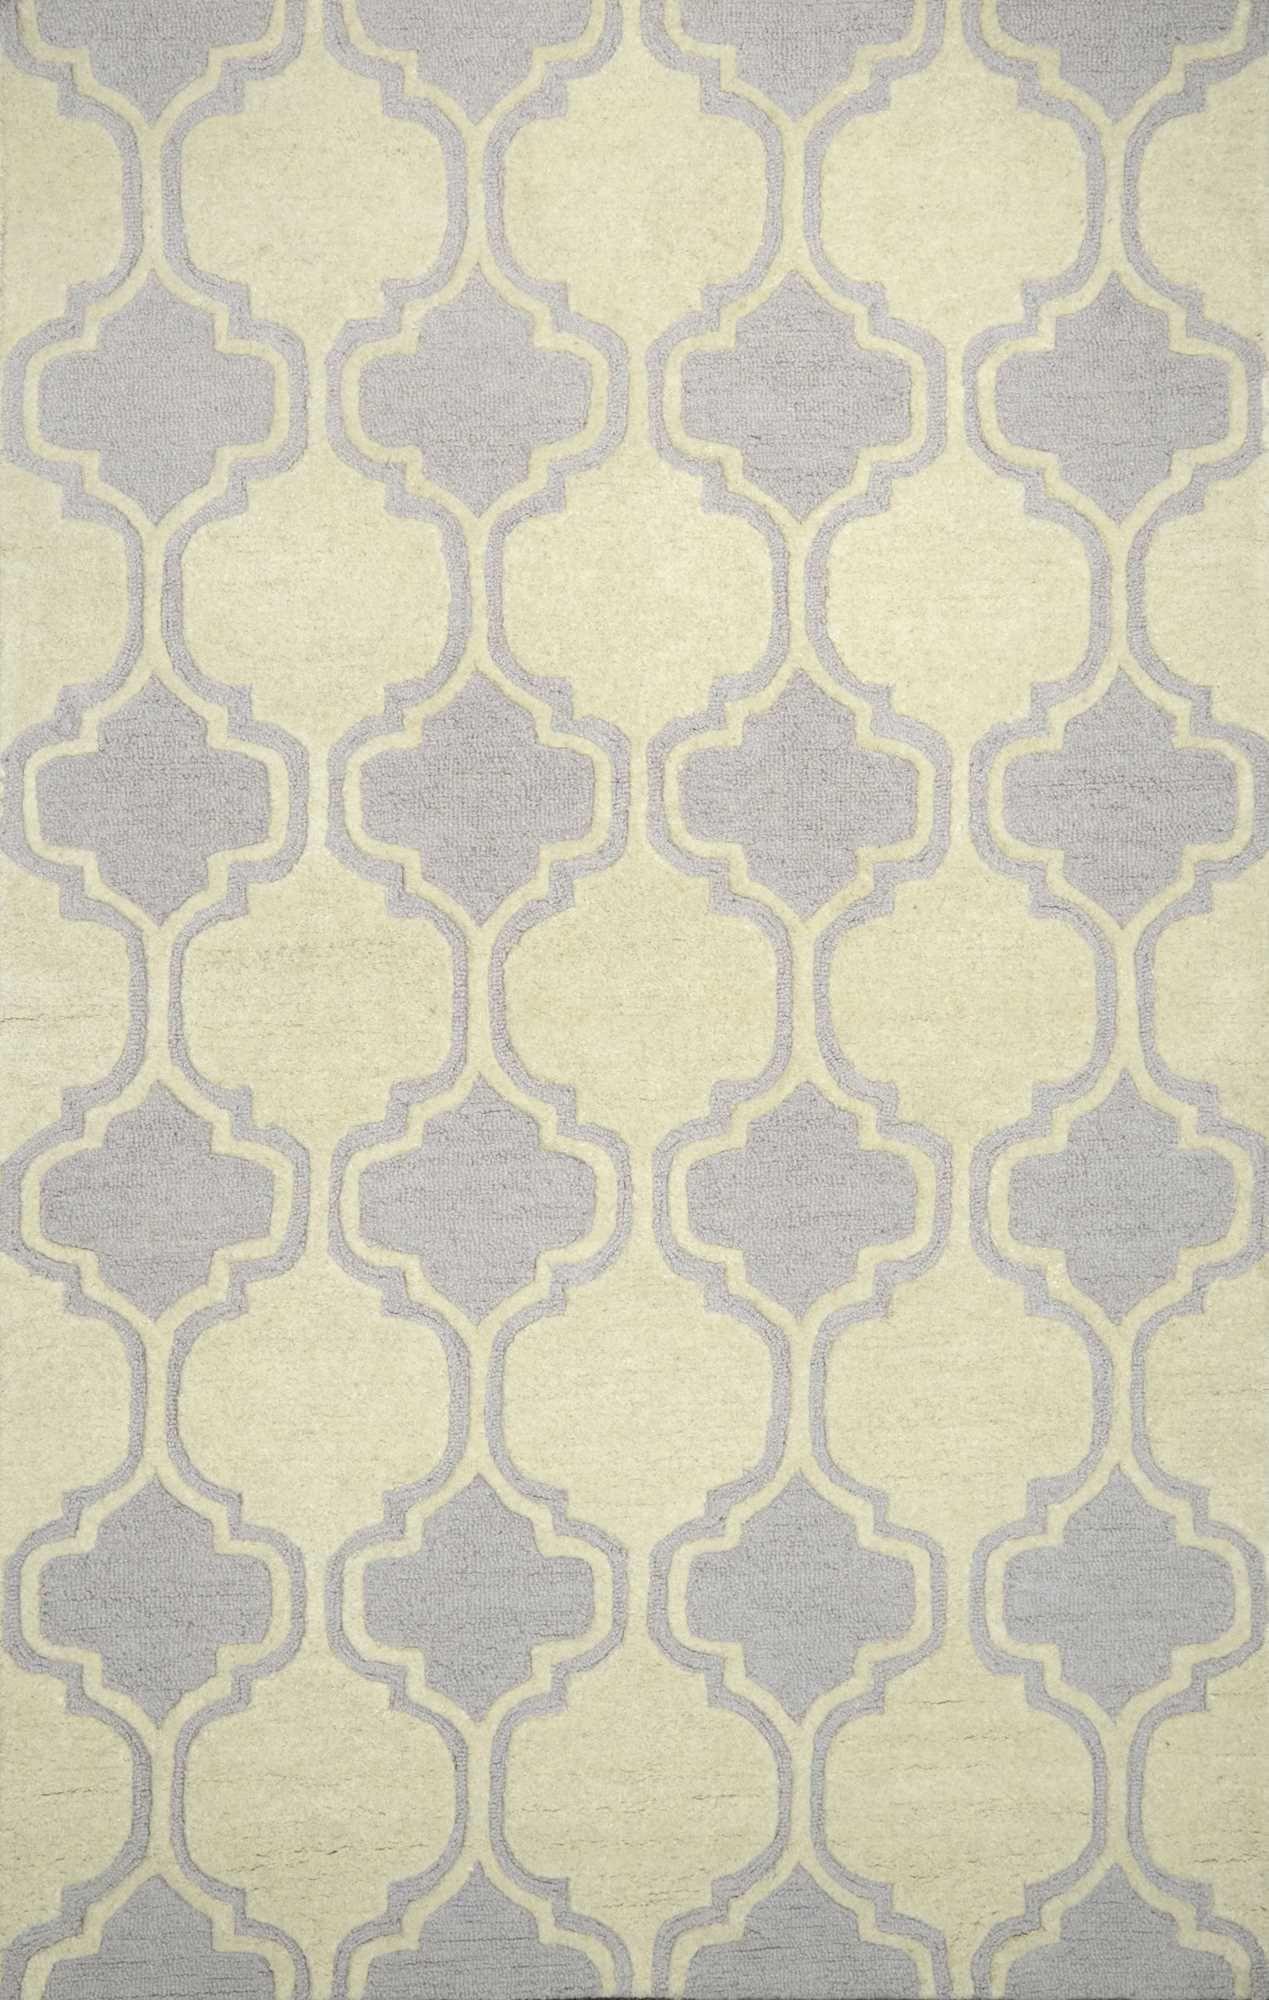 Tuscan Moroccan Trellis VS112 Rug | Living room colors | Pinterest ...